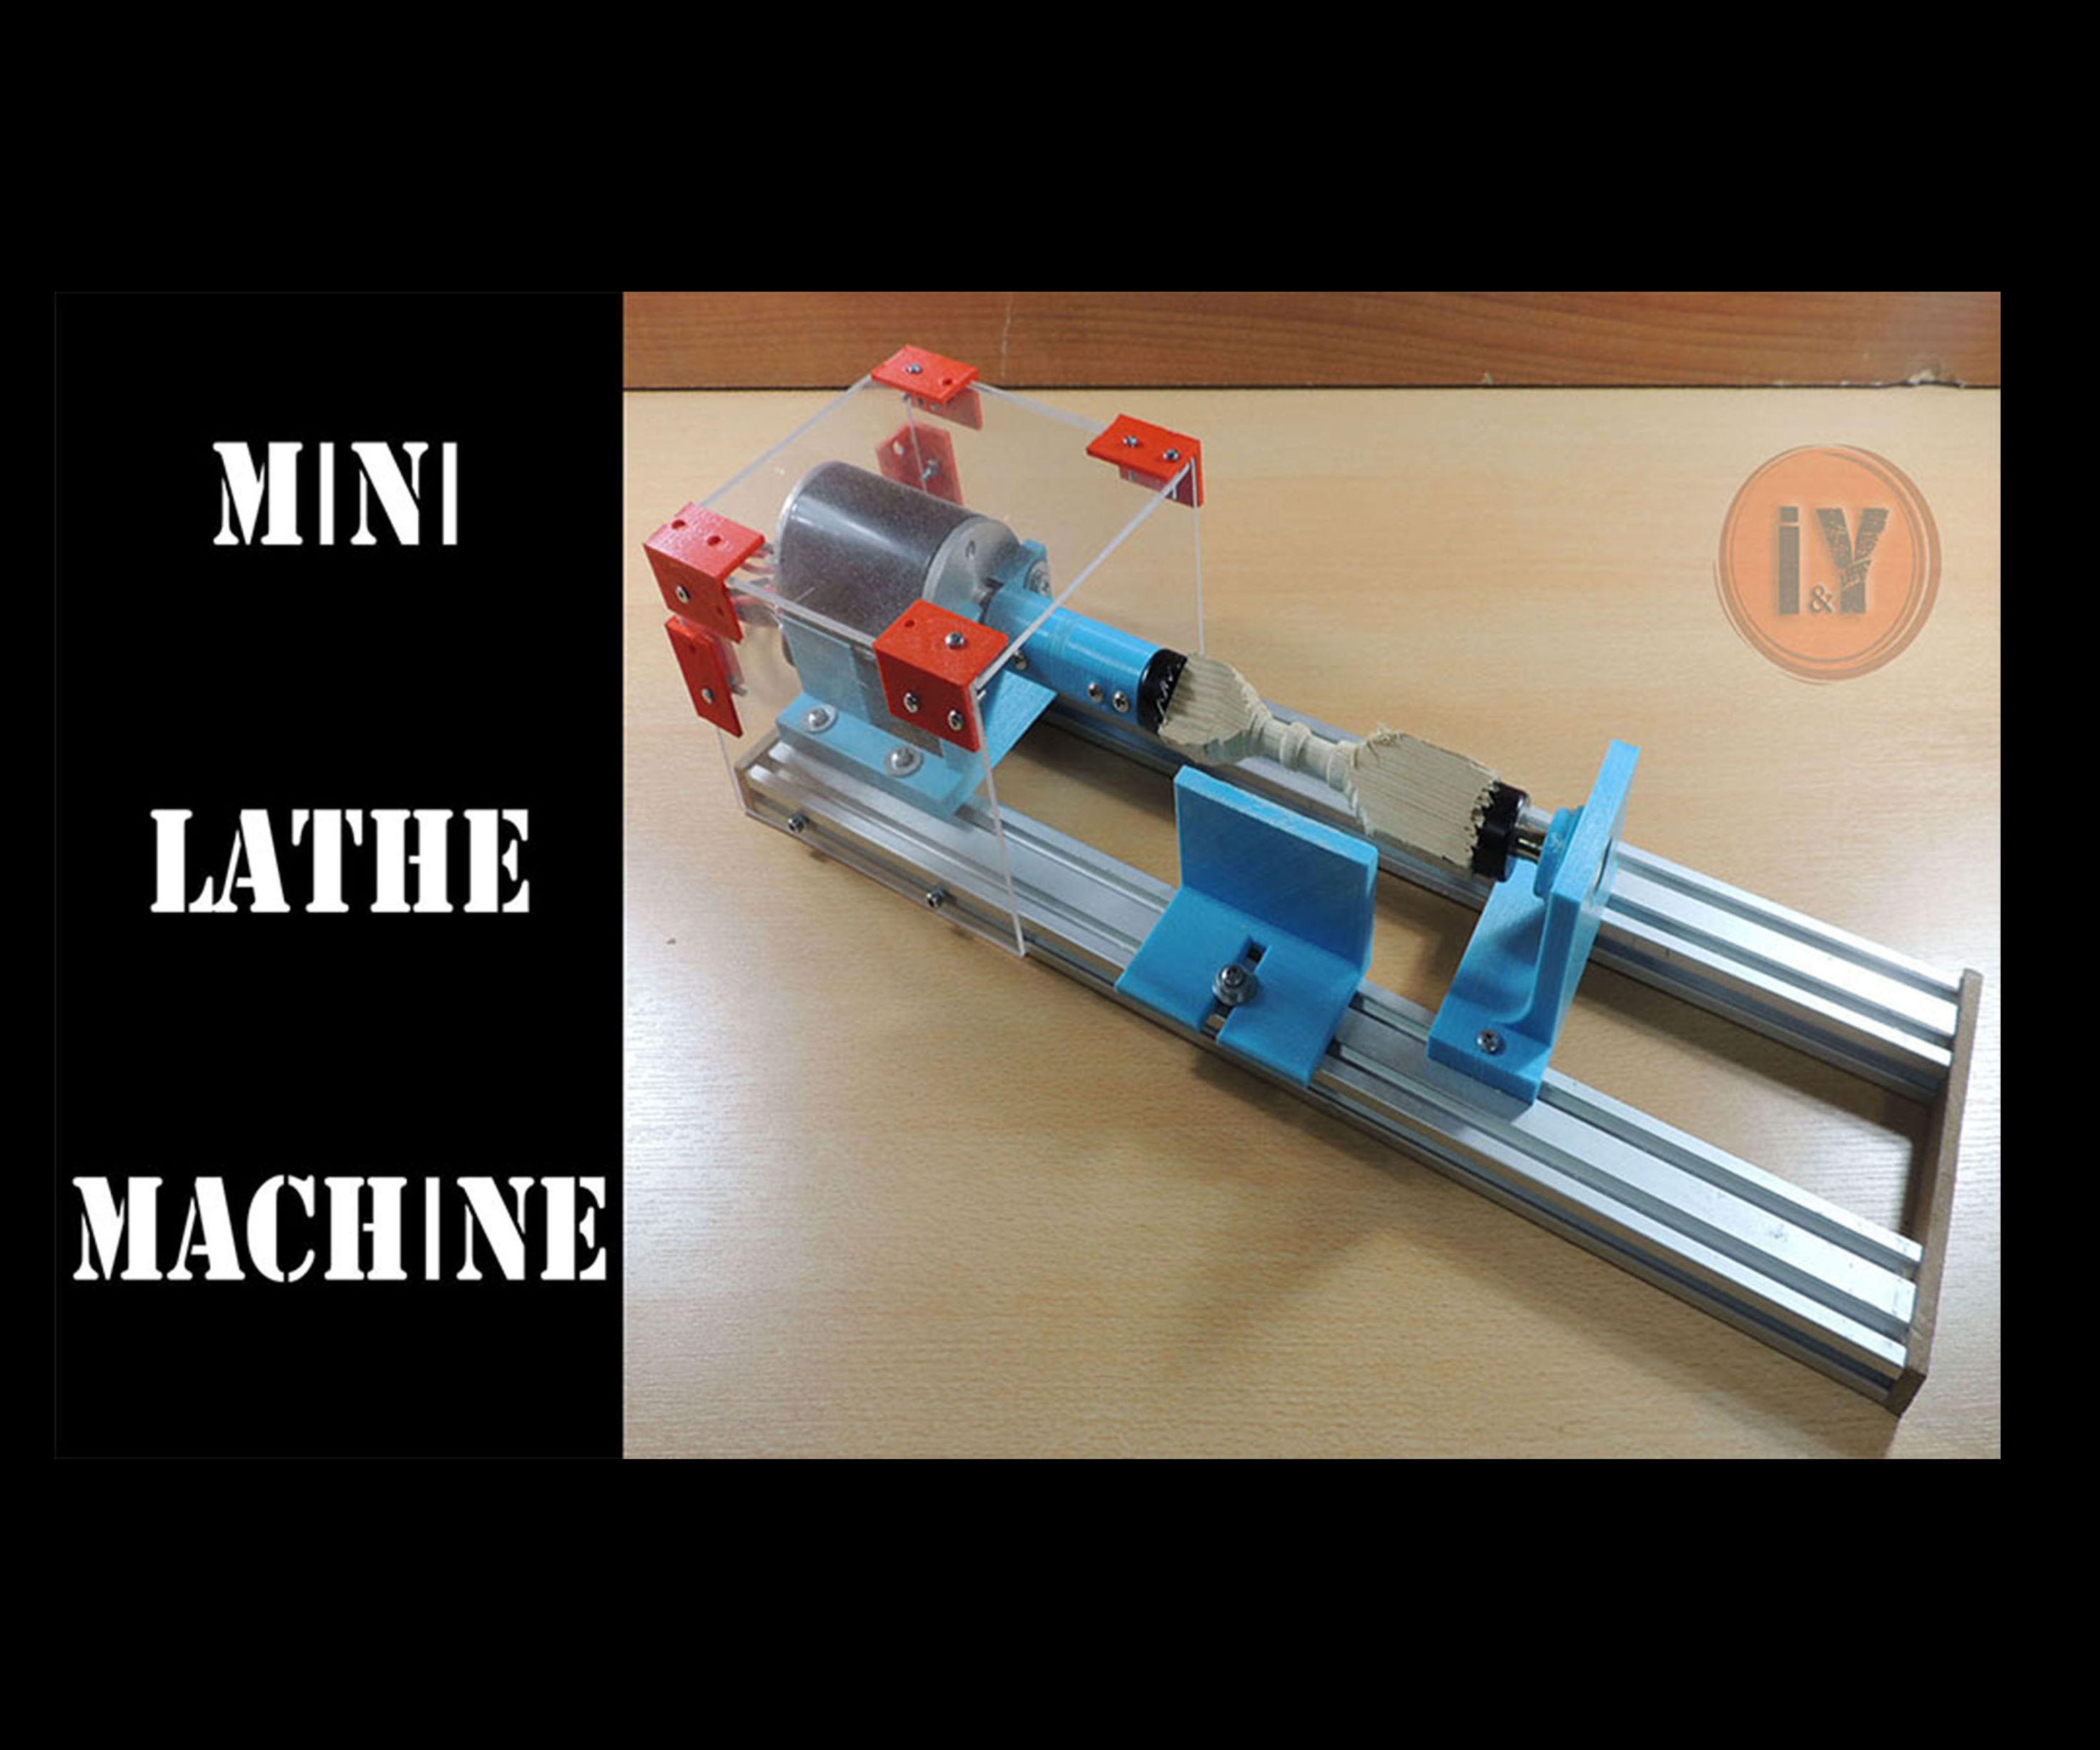 Mini Lathe Machine for Woodworking